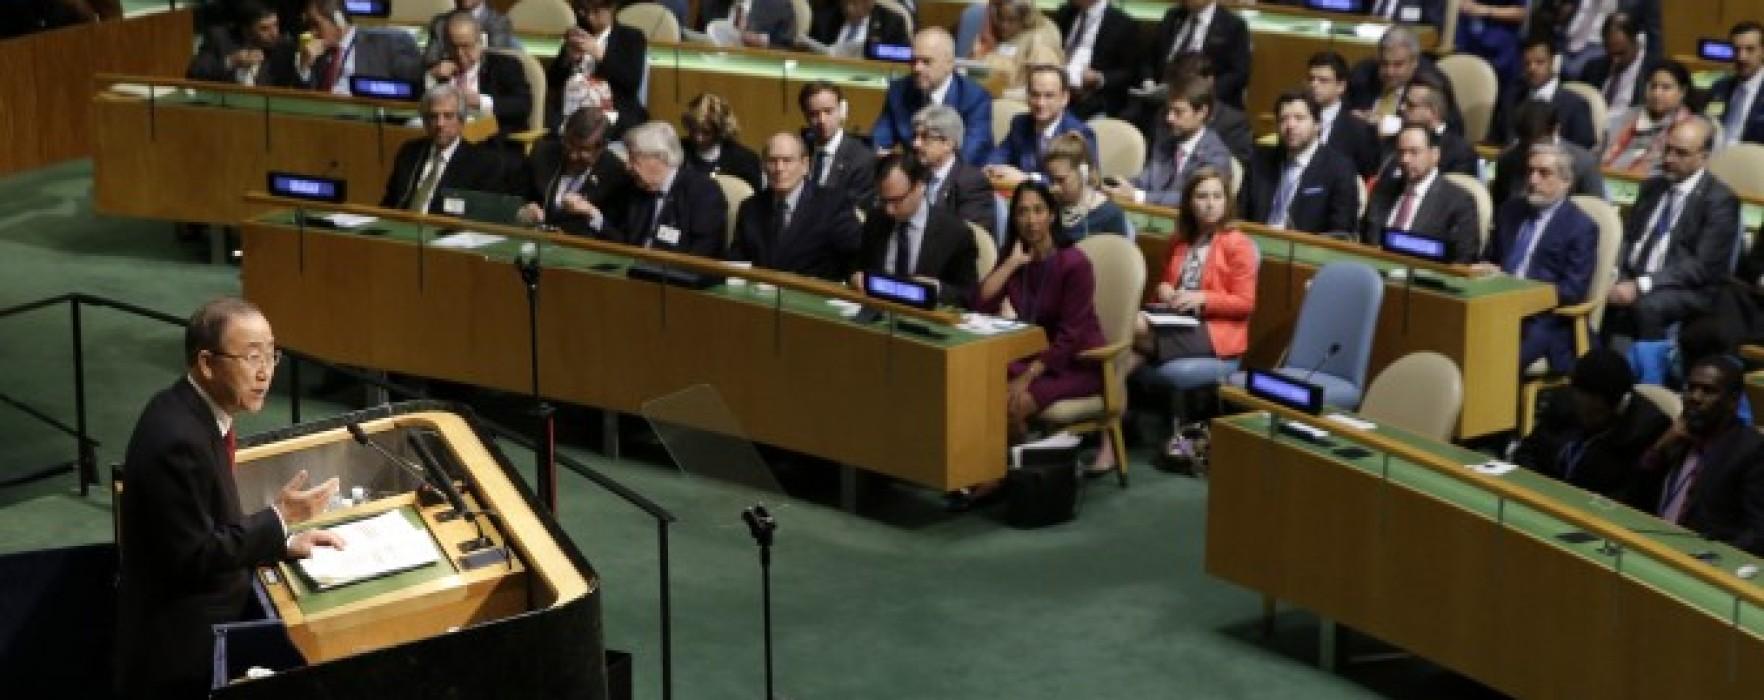 Ban Ki-moon in Syria thubuai ICC ah rel tuhin phuang